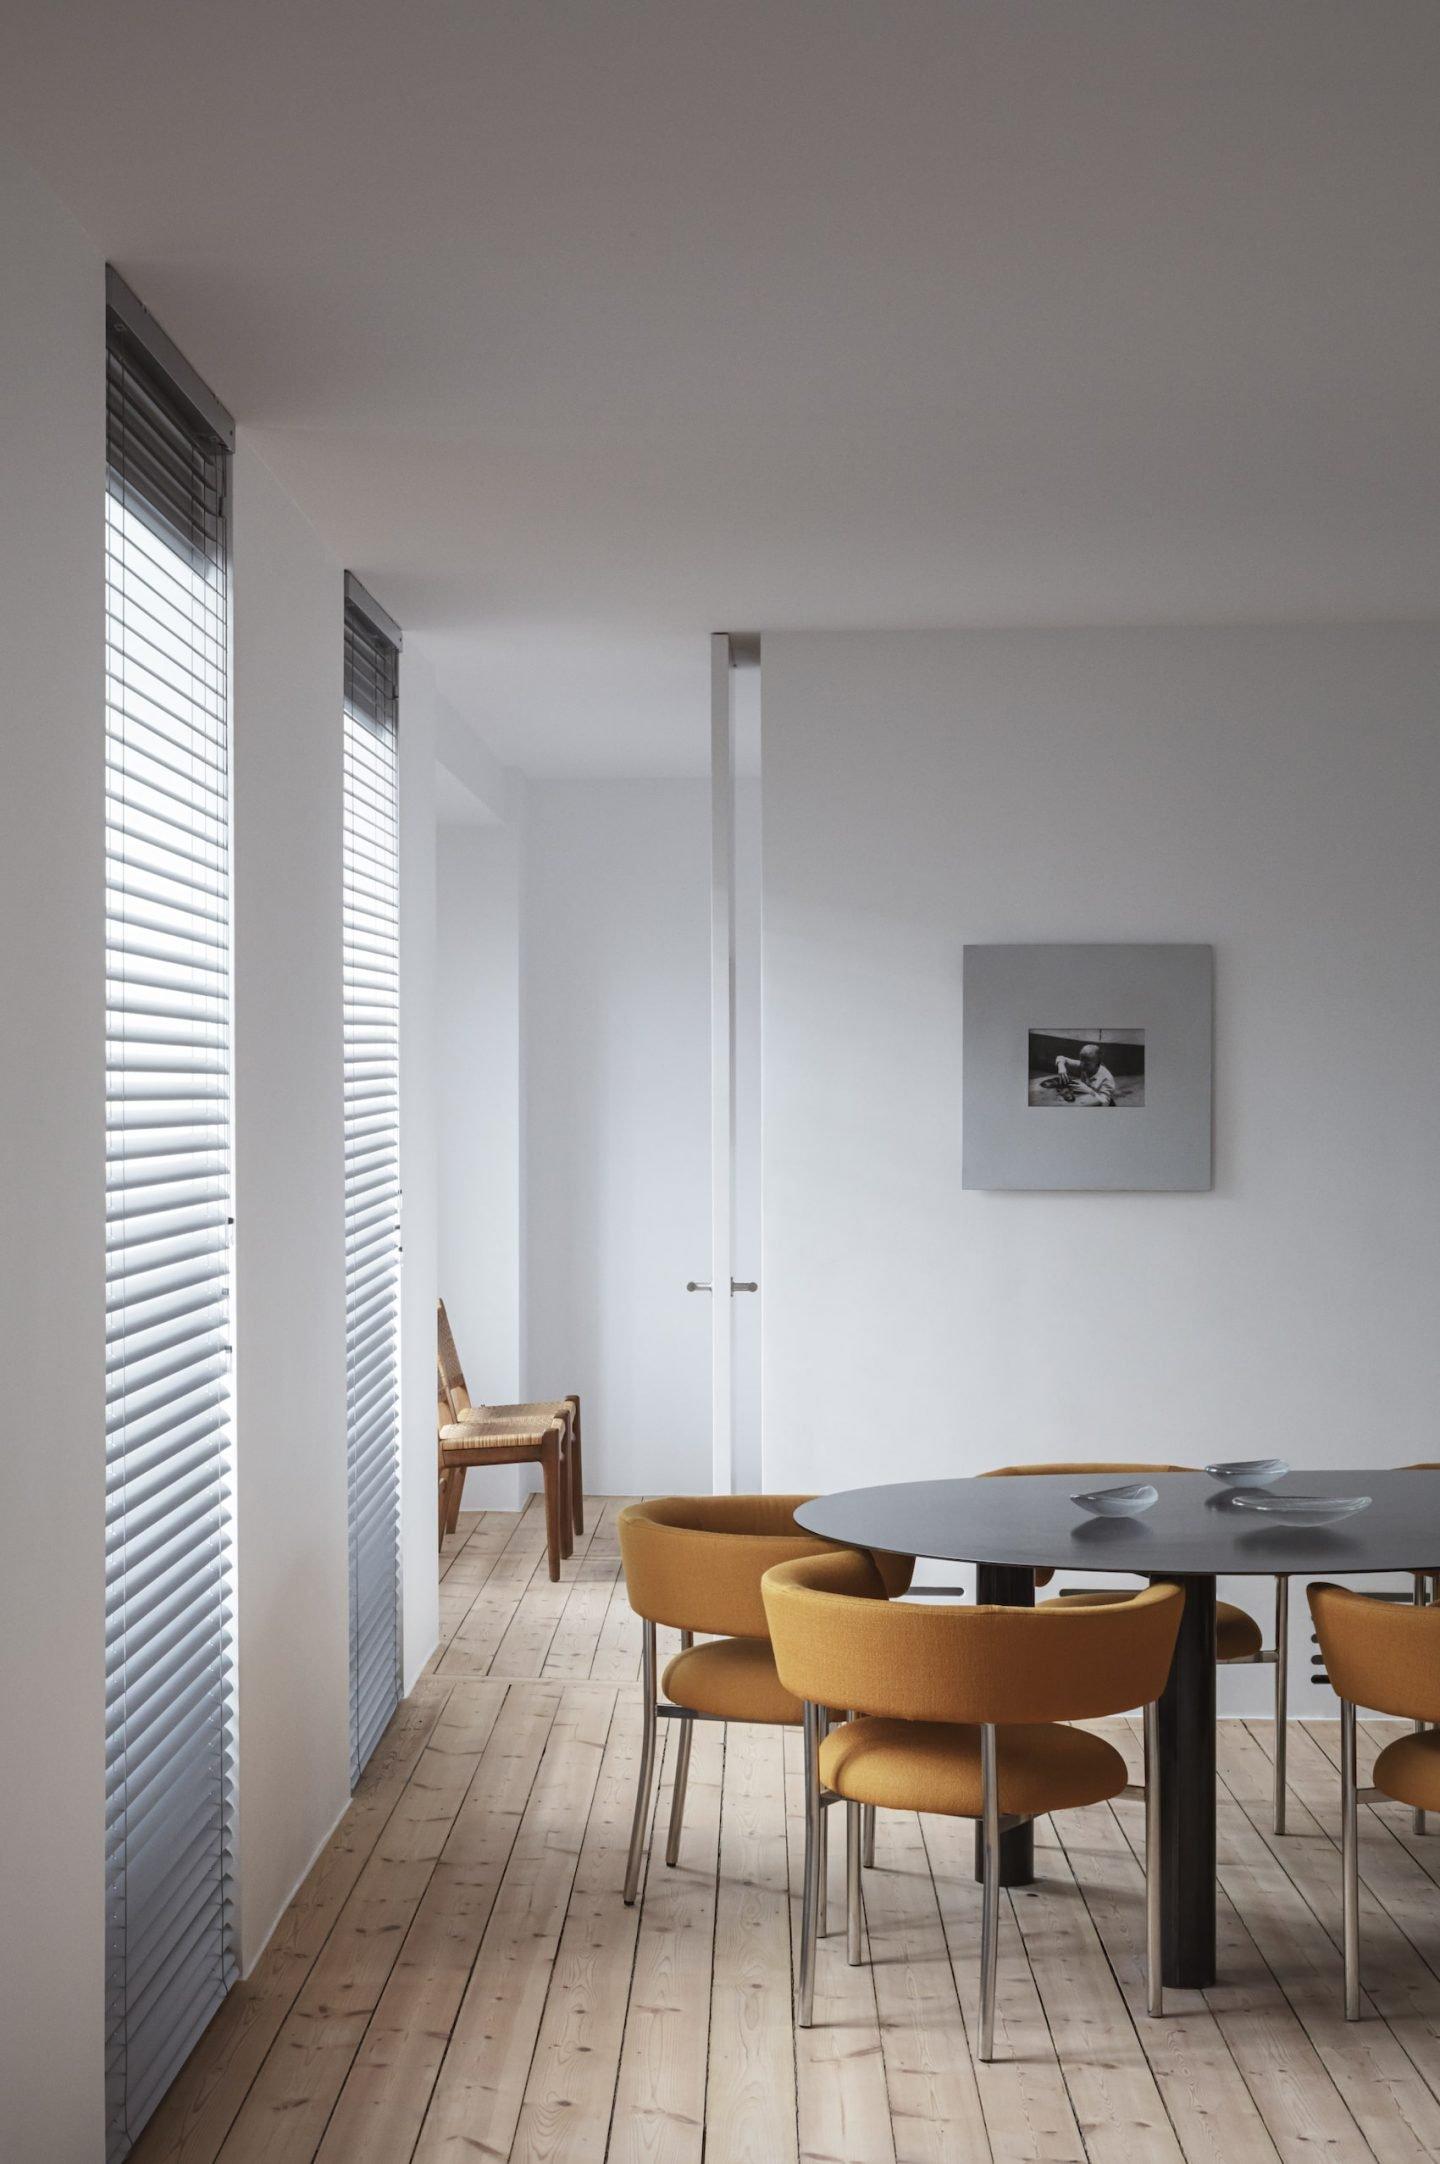 IGNANT-Design-David-Thulstrup-Studio-Visit-05